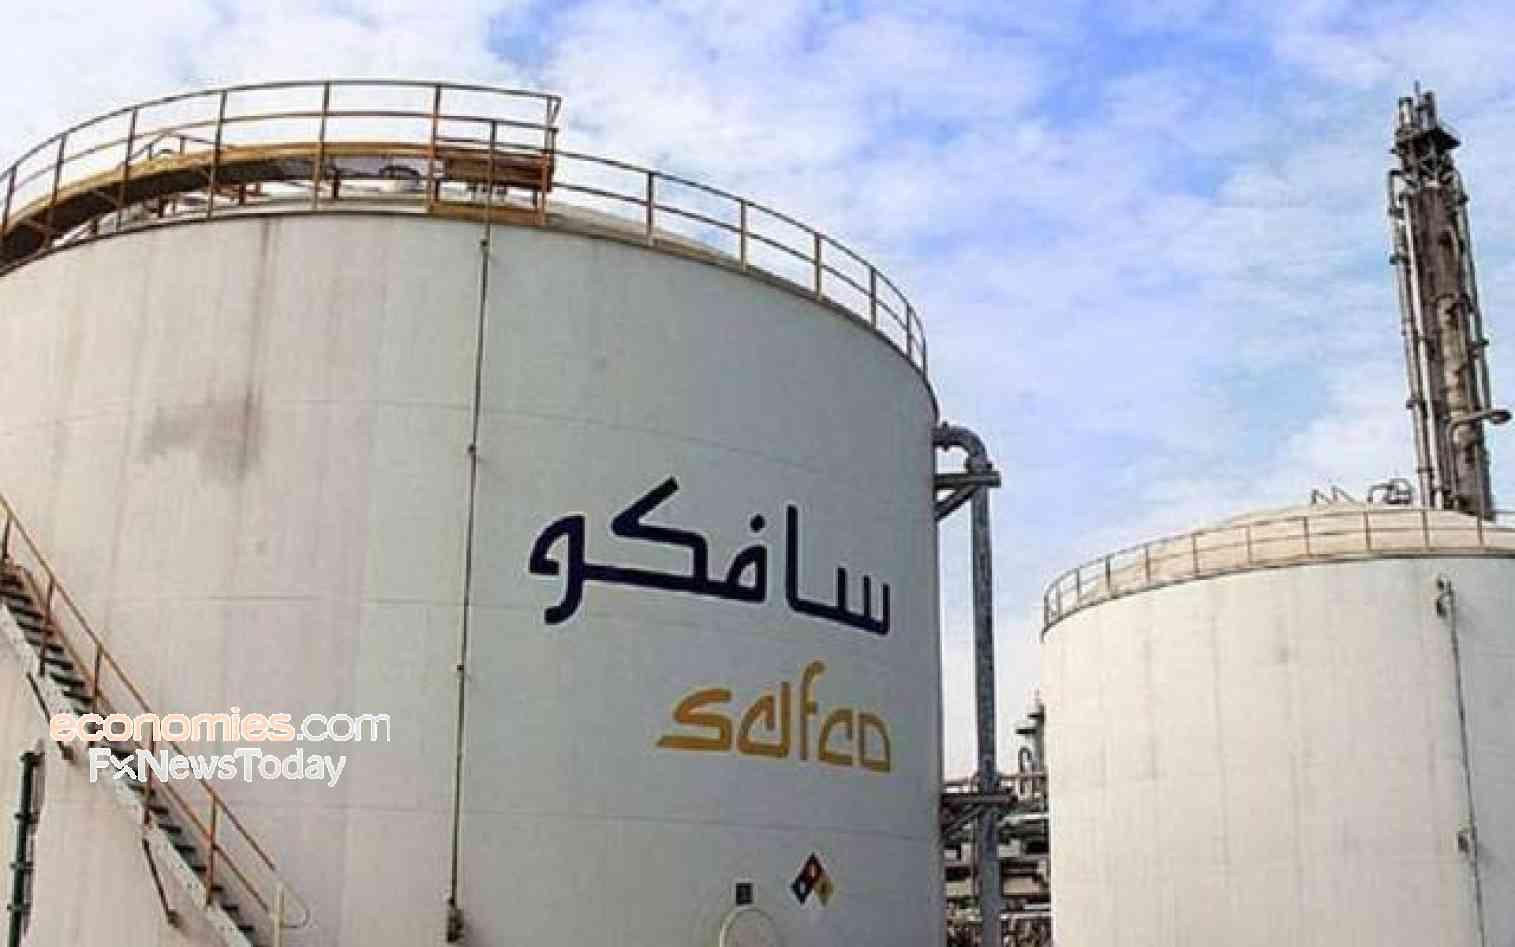 SAFCO Q4 profit surges 809.5% to SAR 568.5 million